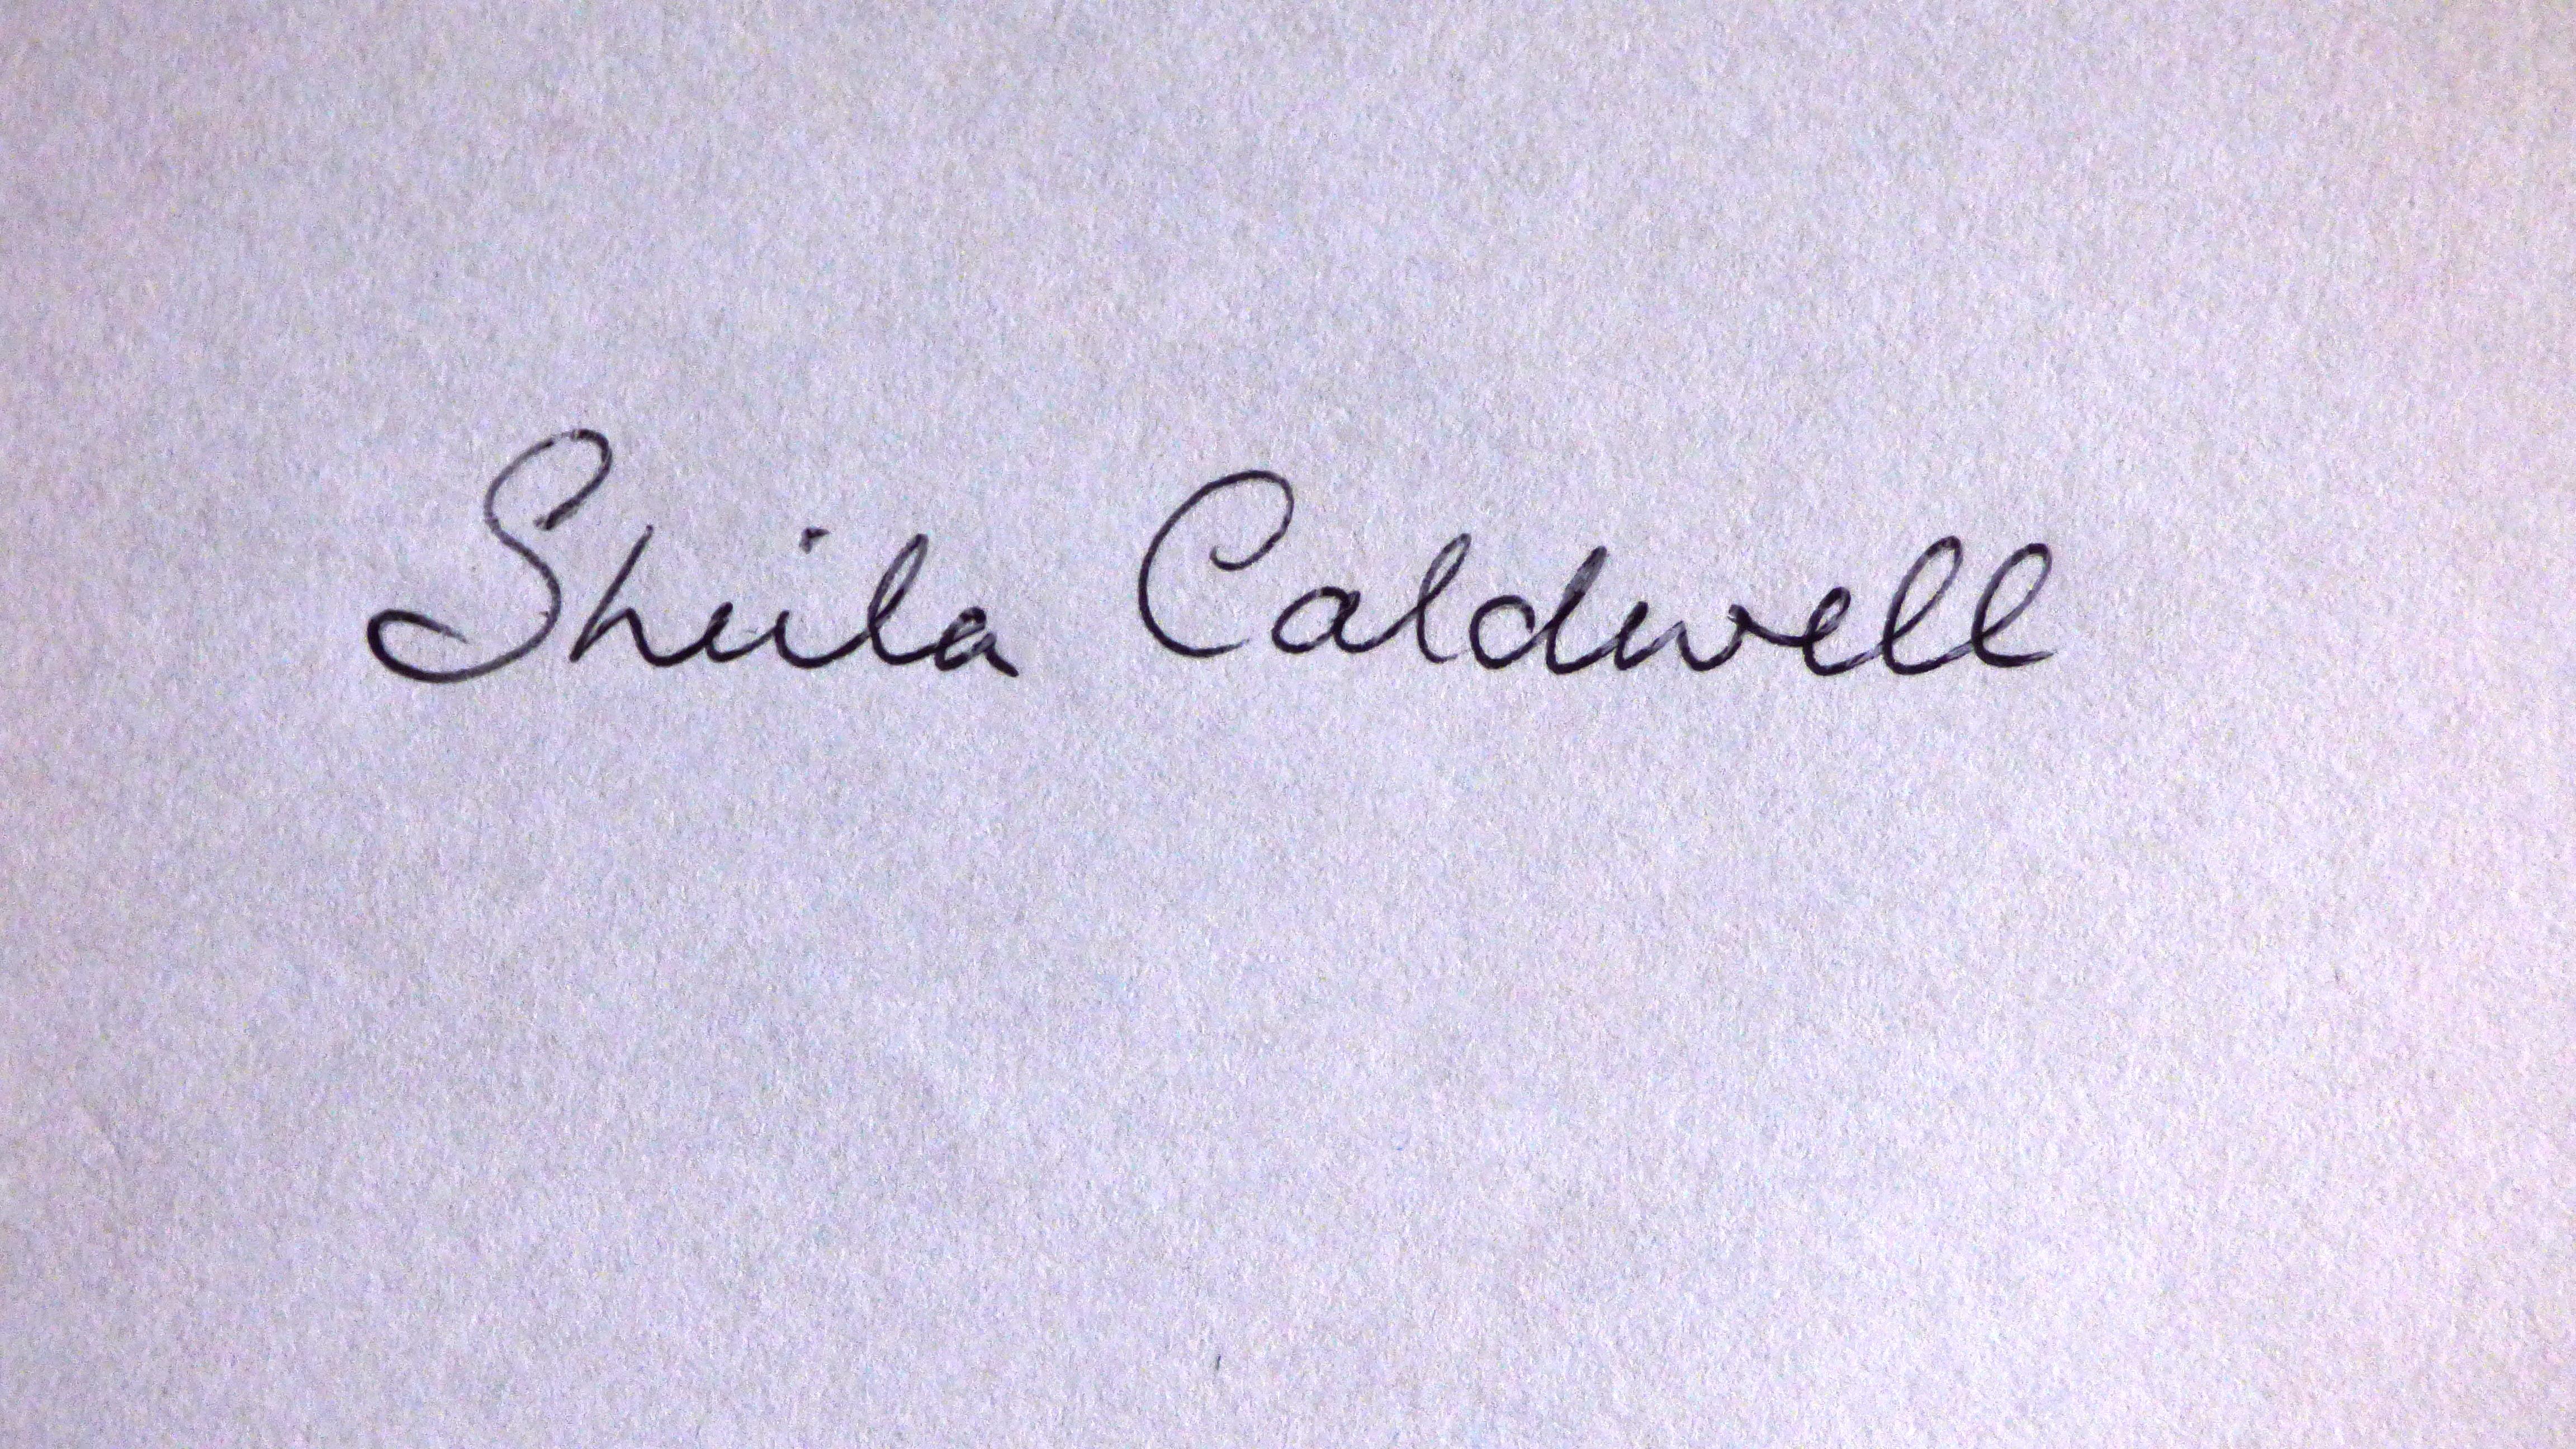 Sheila Caldwell Signature